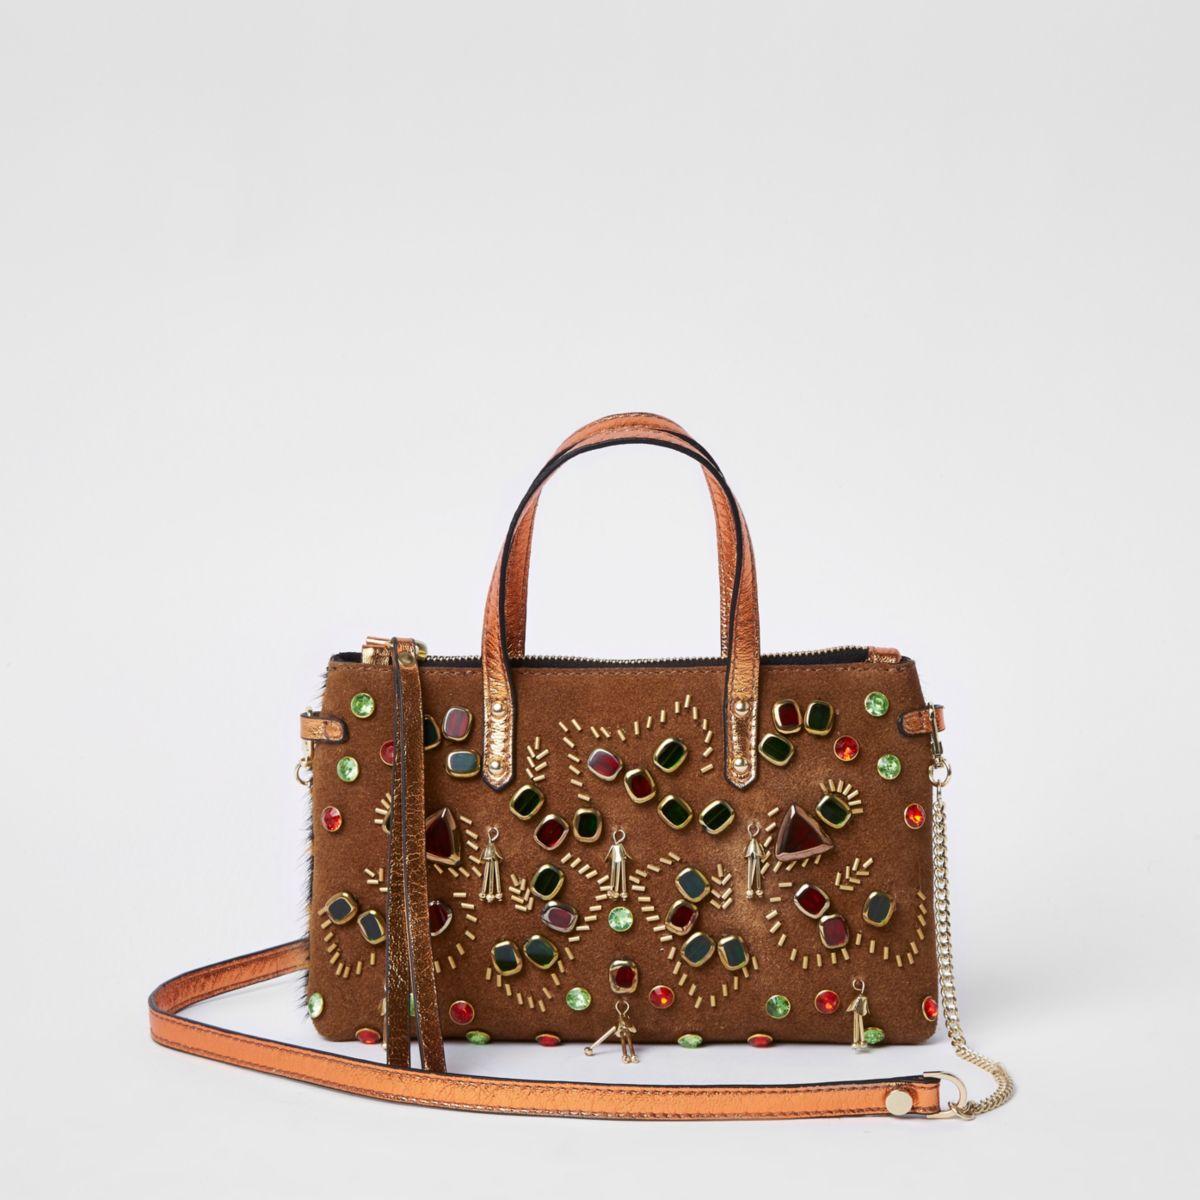 Tan metallic embellished cross body chain bag